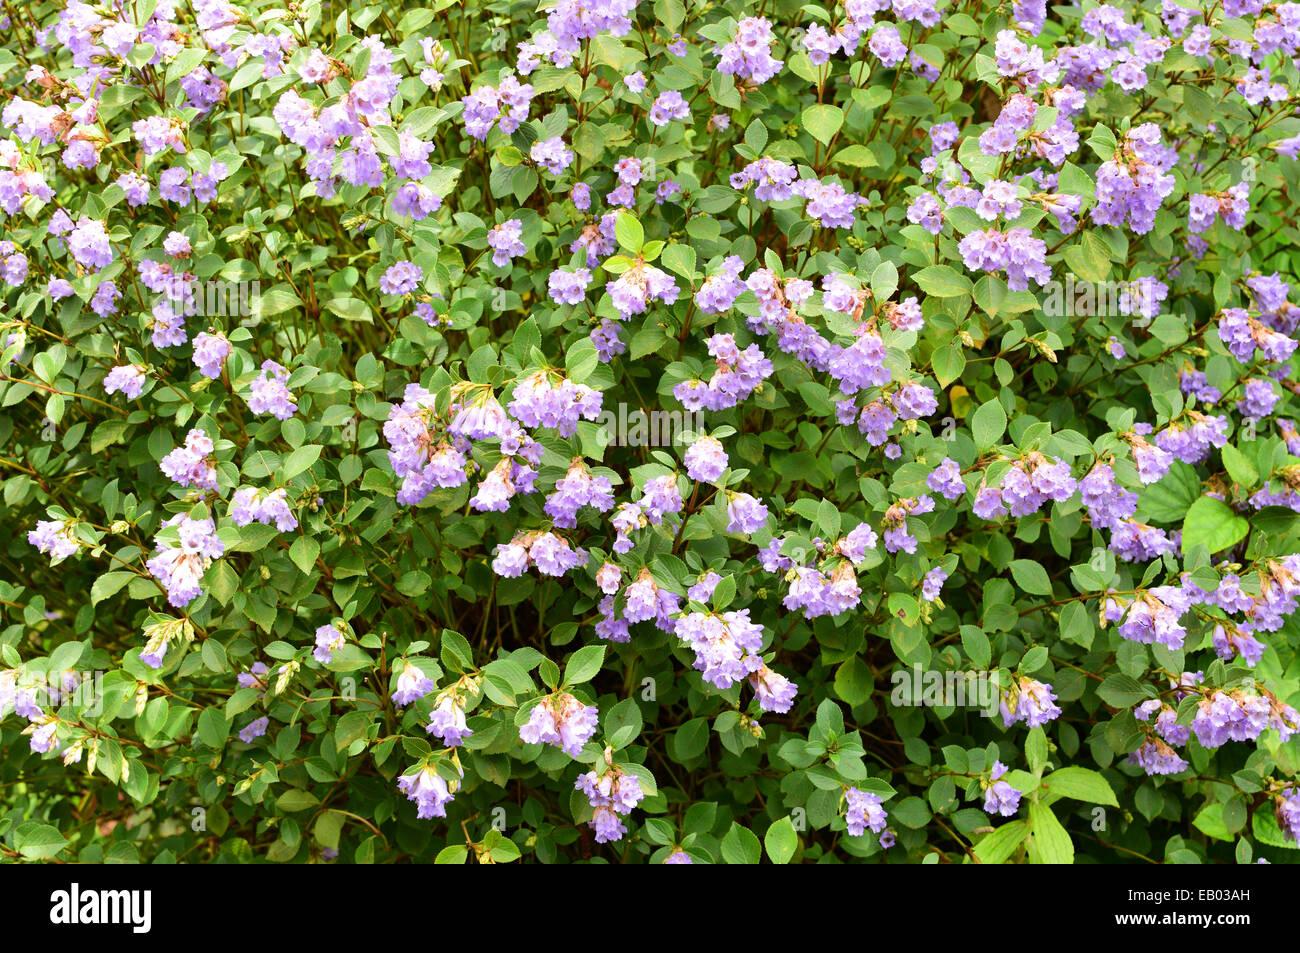 Neelakurinji Flowers in Munnar Hills Kerala India Strobilanthes kunthiana flower - Stock Image